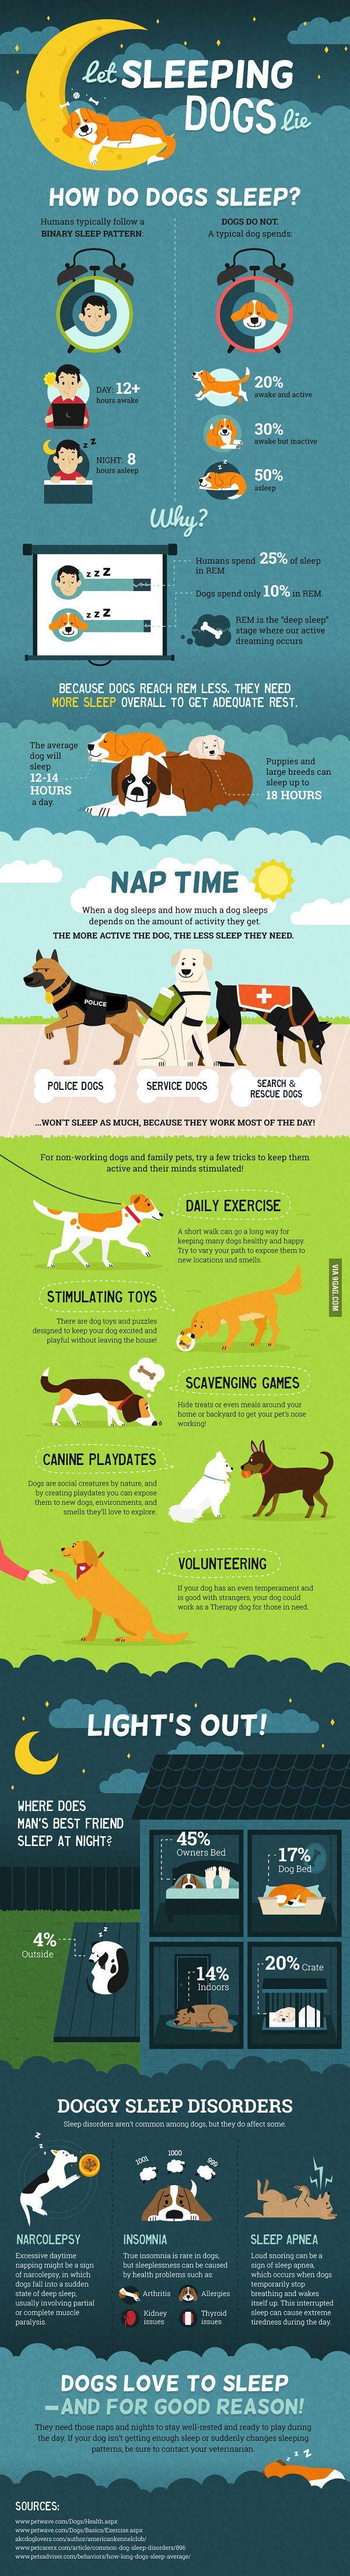 How Much Sleep Do Dogs Need? - 9GAG